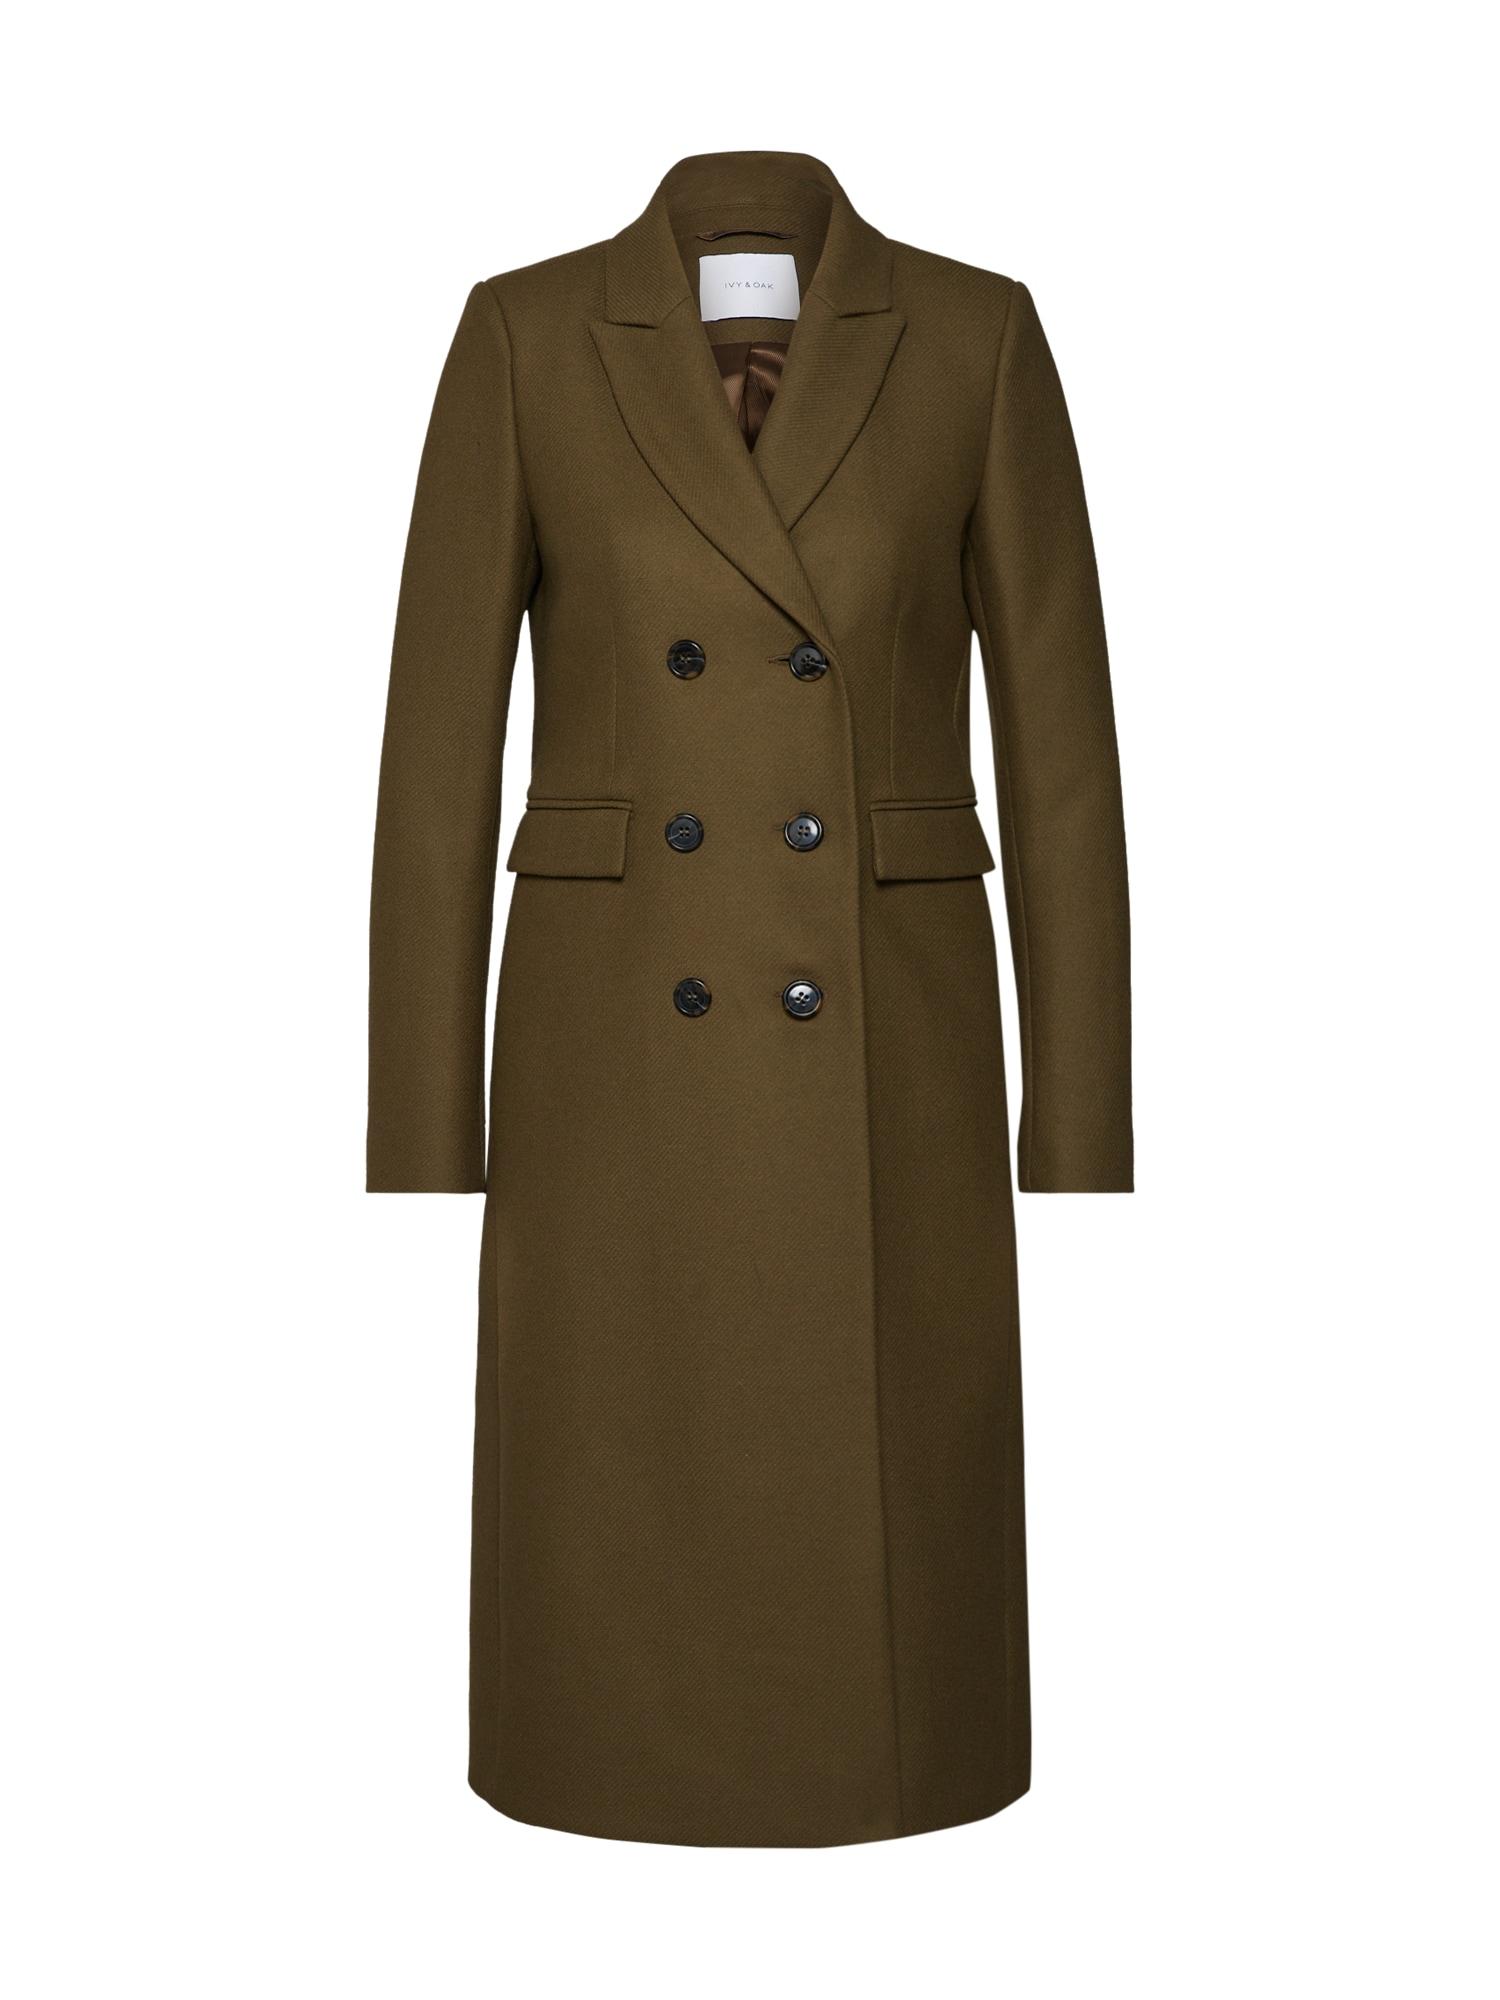 Přechodný kabát khaki IVY & OAK